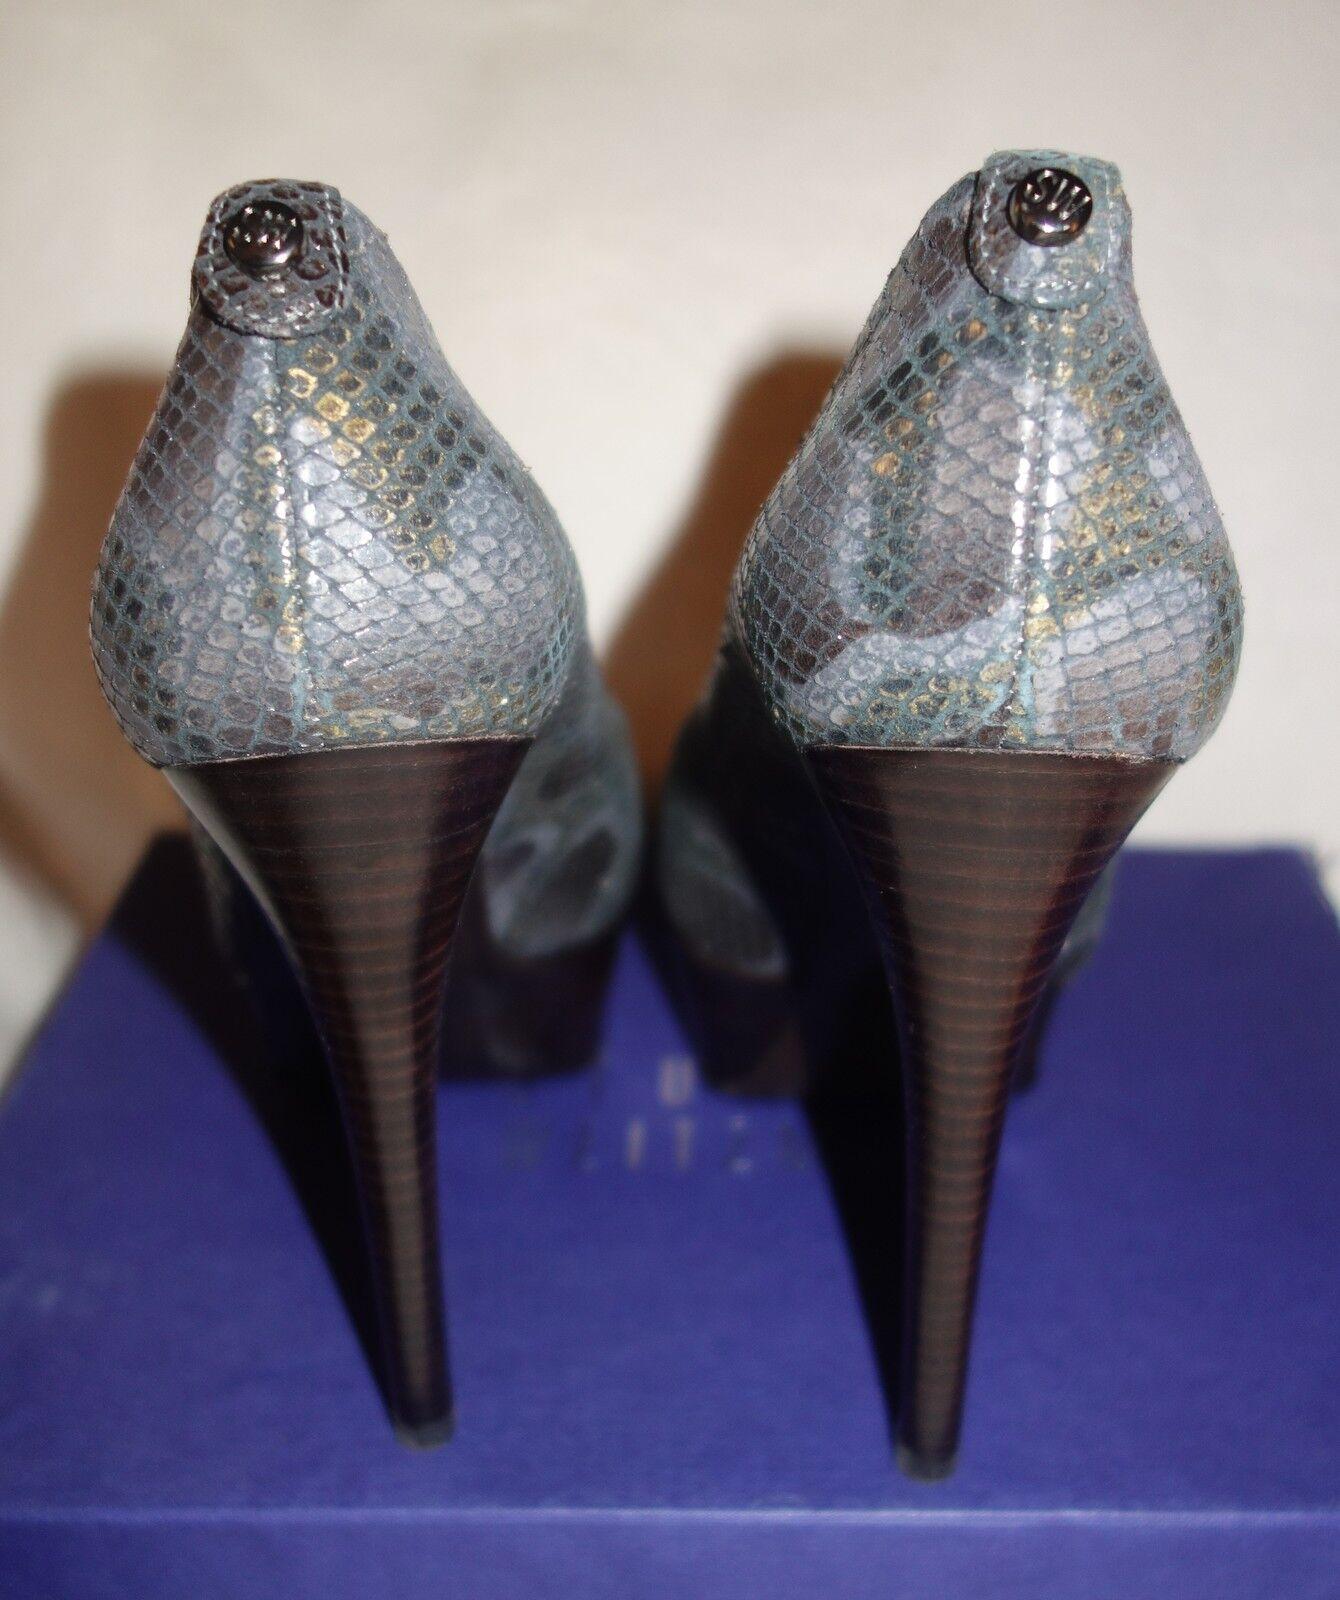 Stuart Weitzman 'Lille' 'Lille' 'Lille' Genuine Leather Pumps platform snake sz 39 US 8.5 new 637423